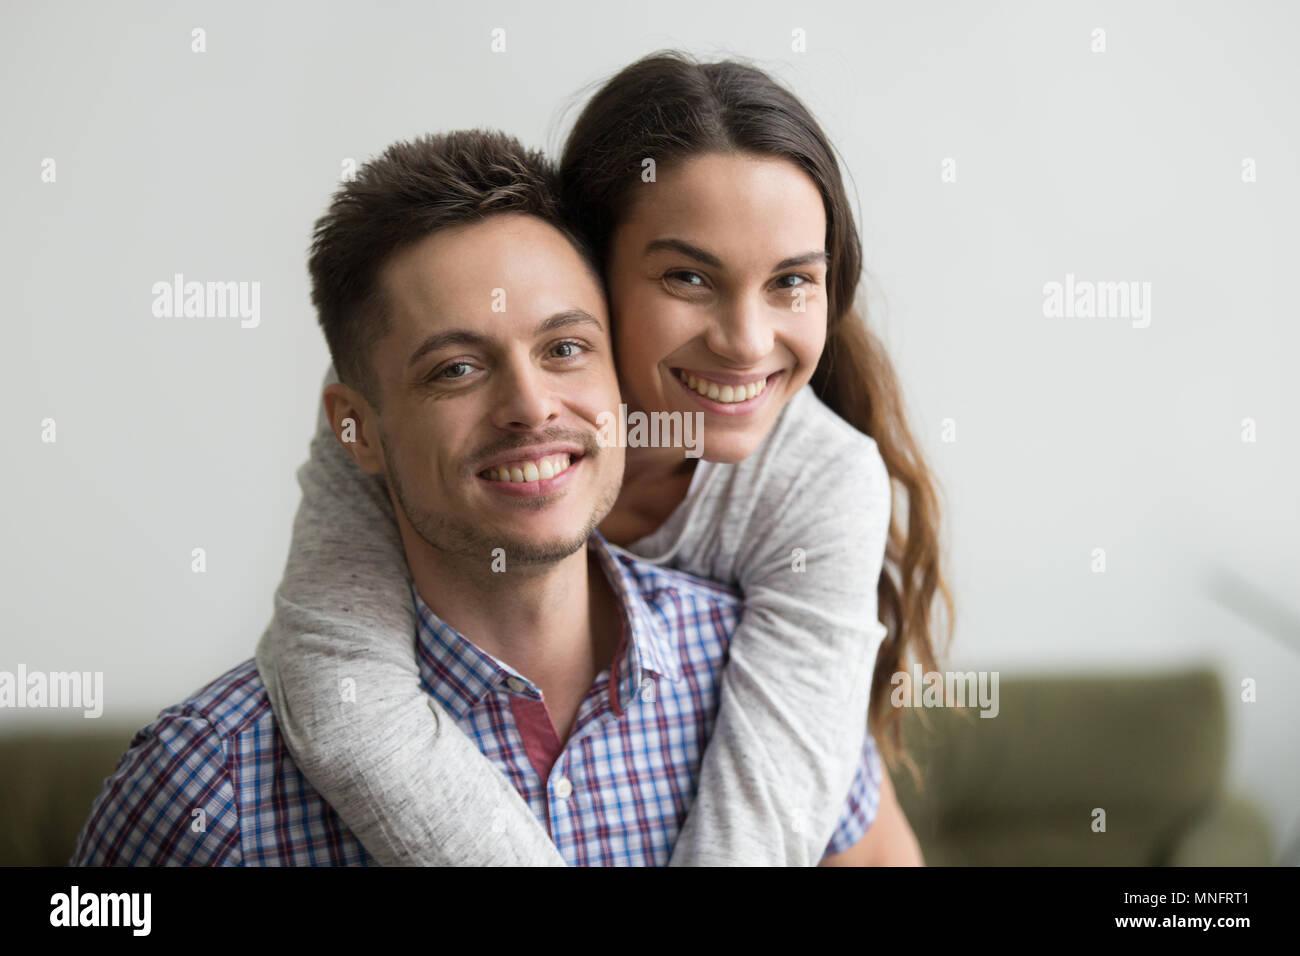 Hombre sonriendo alegre piggyback esposa mirando a la cámara Imagen De Stock